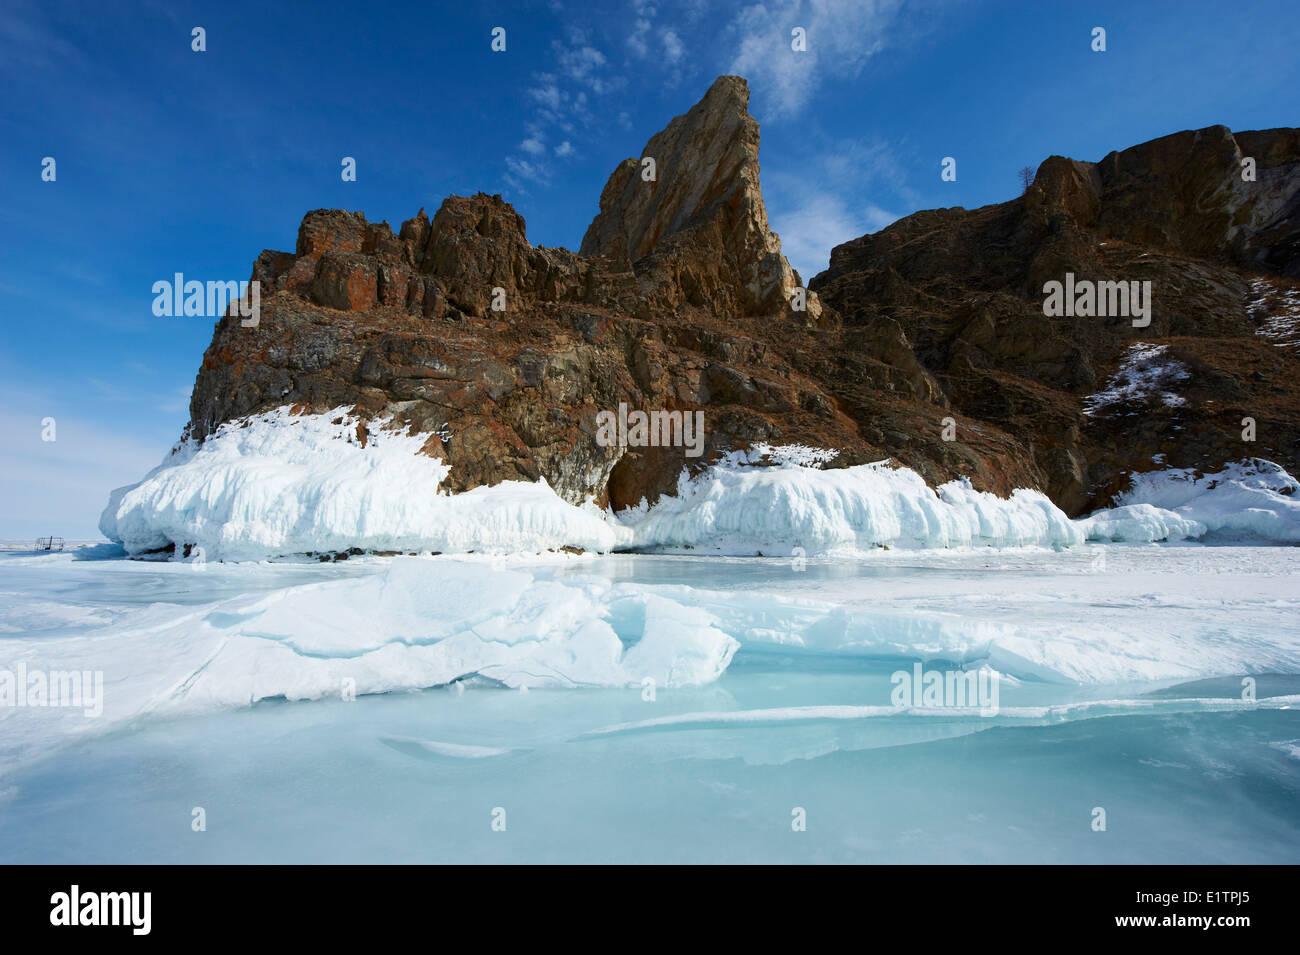 Russia, Siberia, Irkutsk oblast, Baikal lake, Maloe More (little sea), frozen lake during winter, Olkhon island - Stock Image